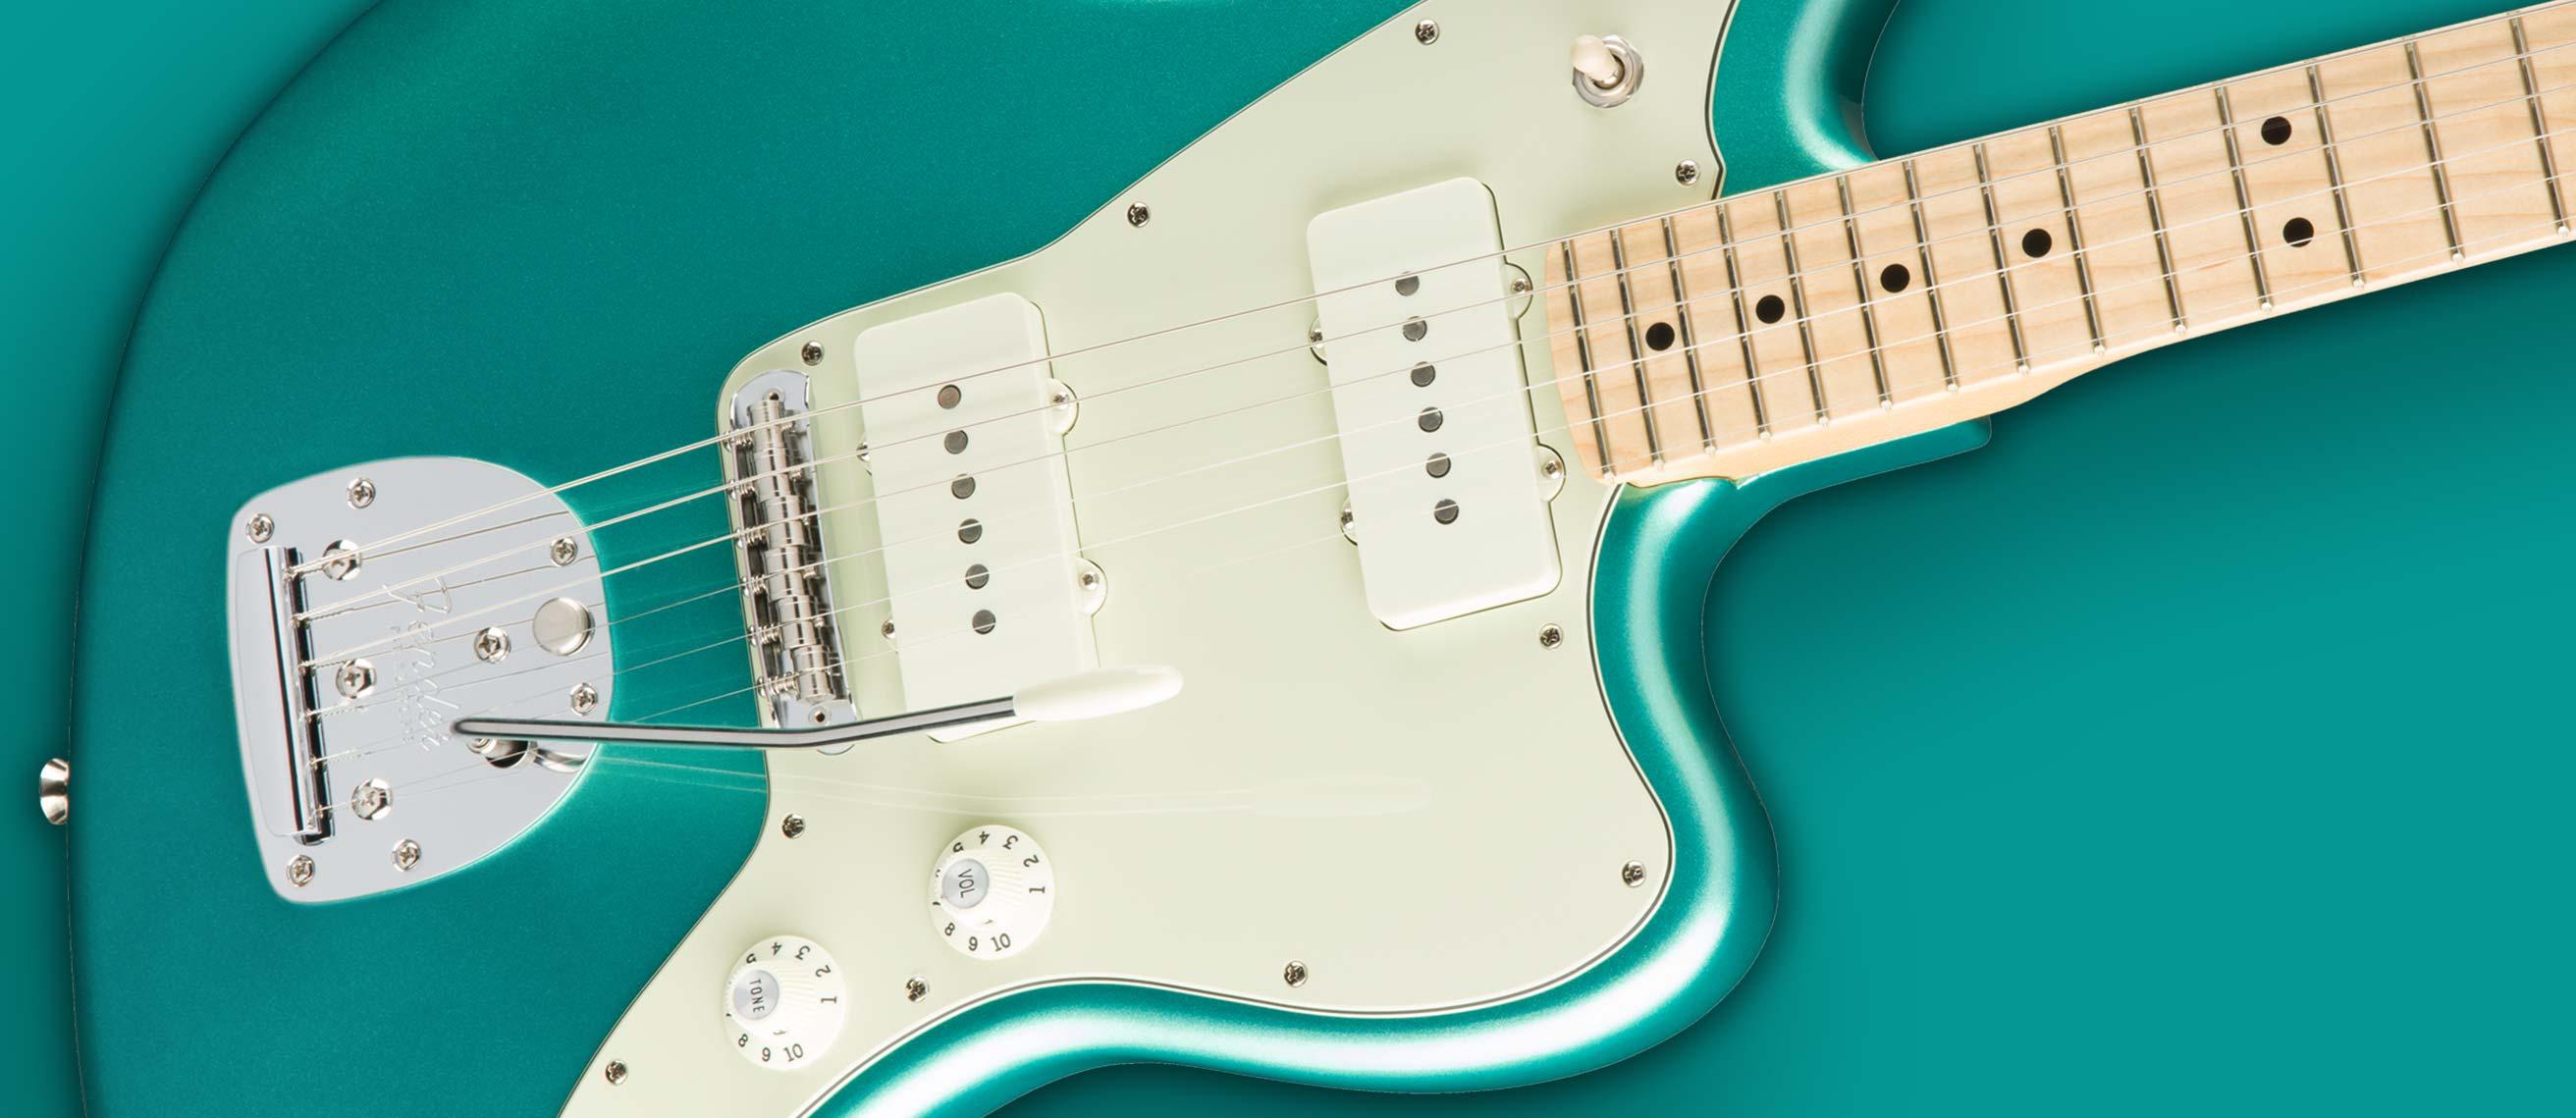 Wiring Diagram For Mosrite Guitars - Trusted Wiring Diagrams